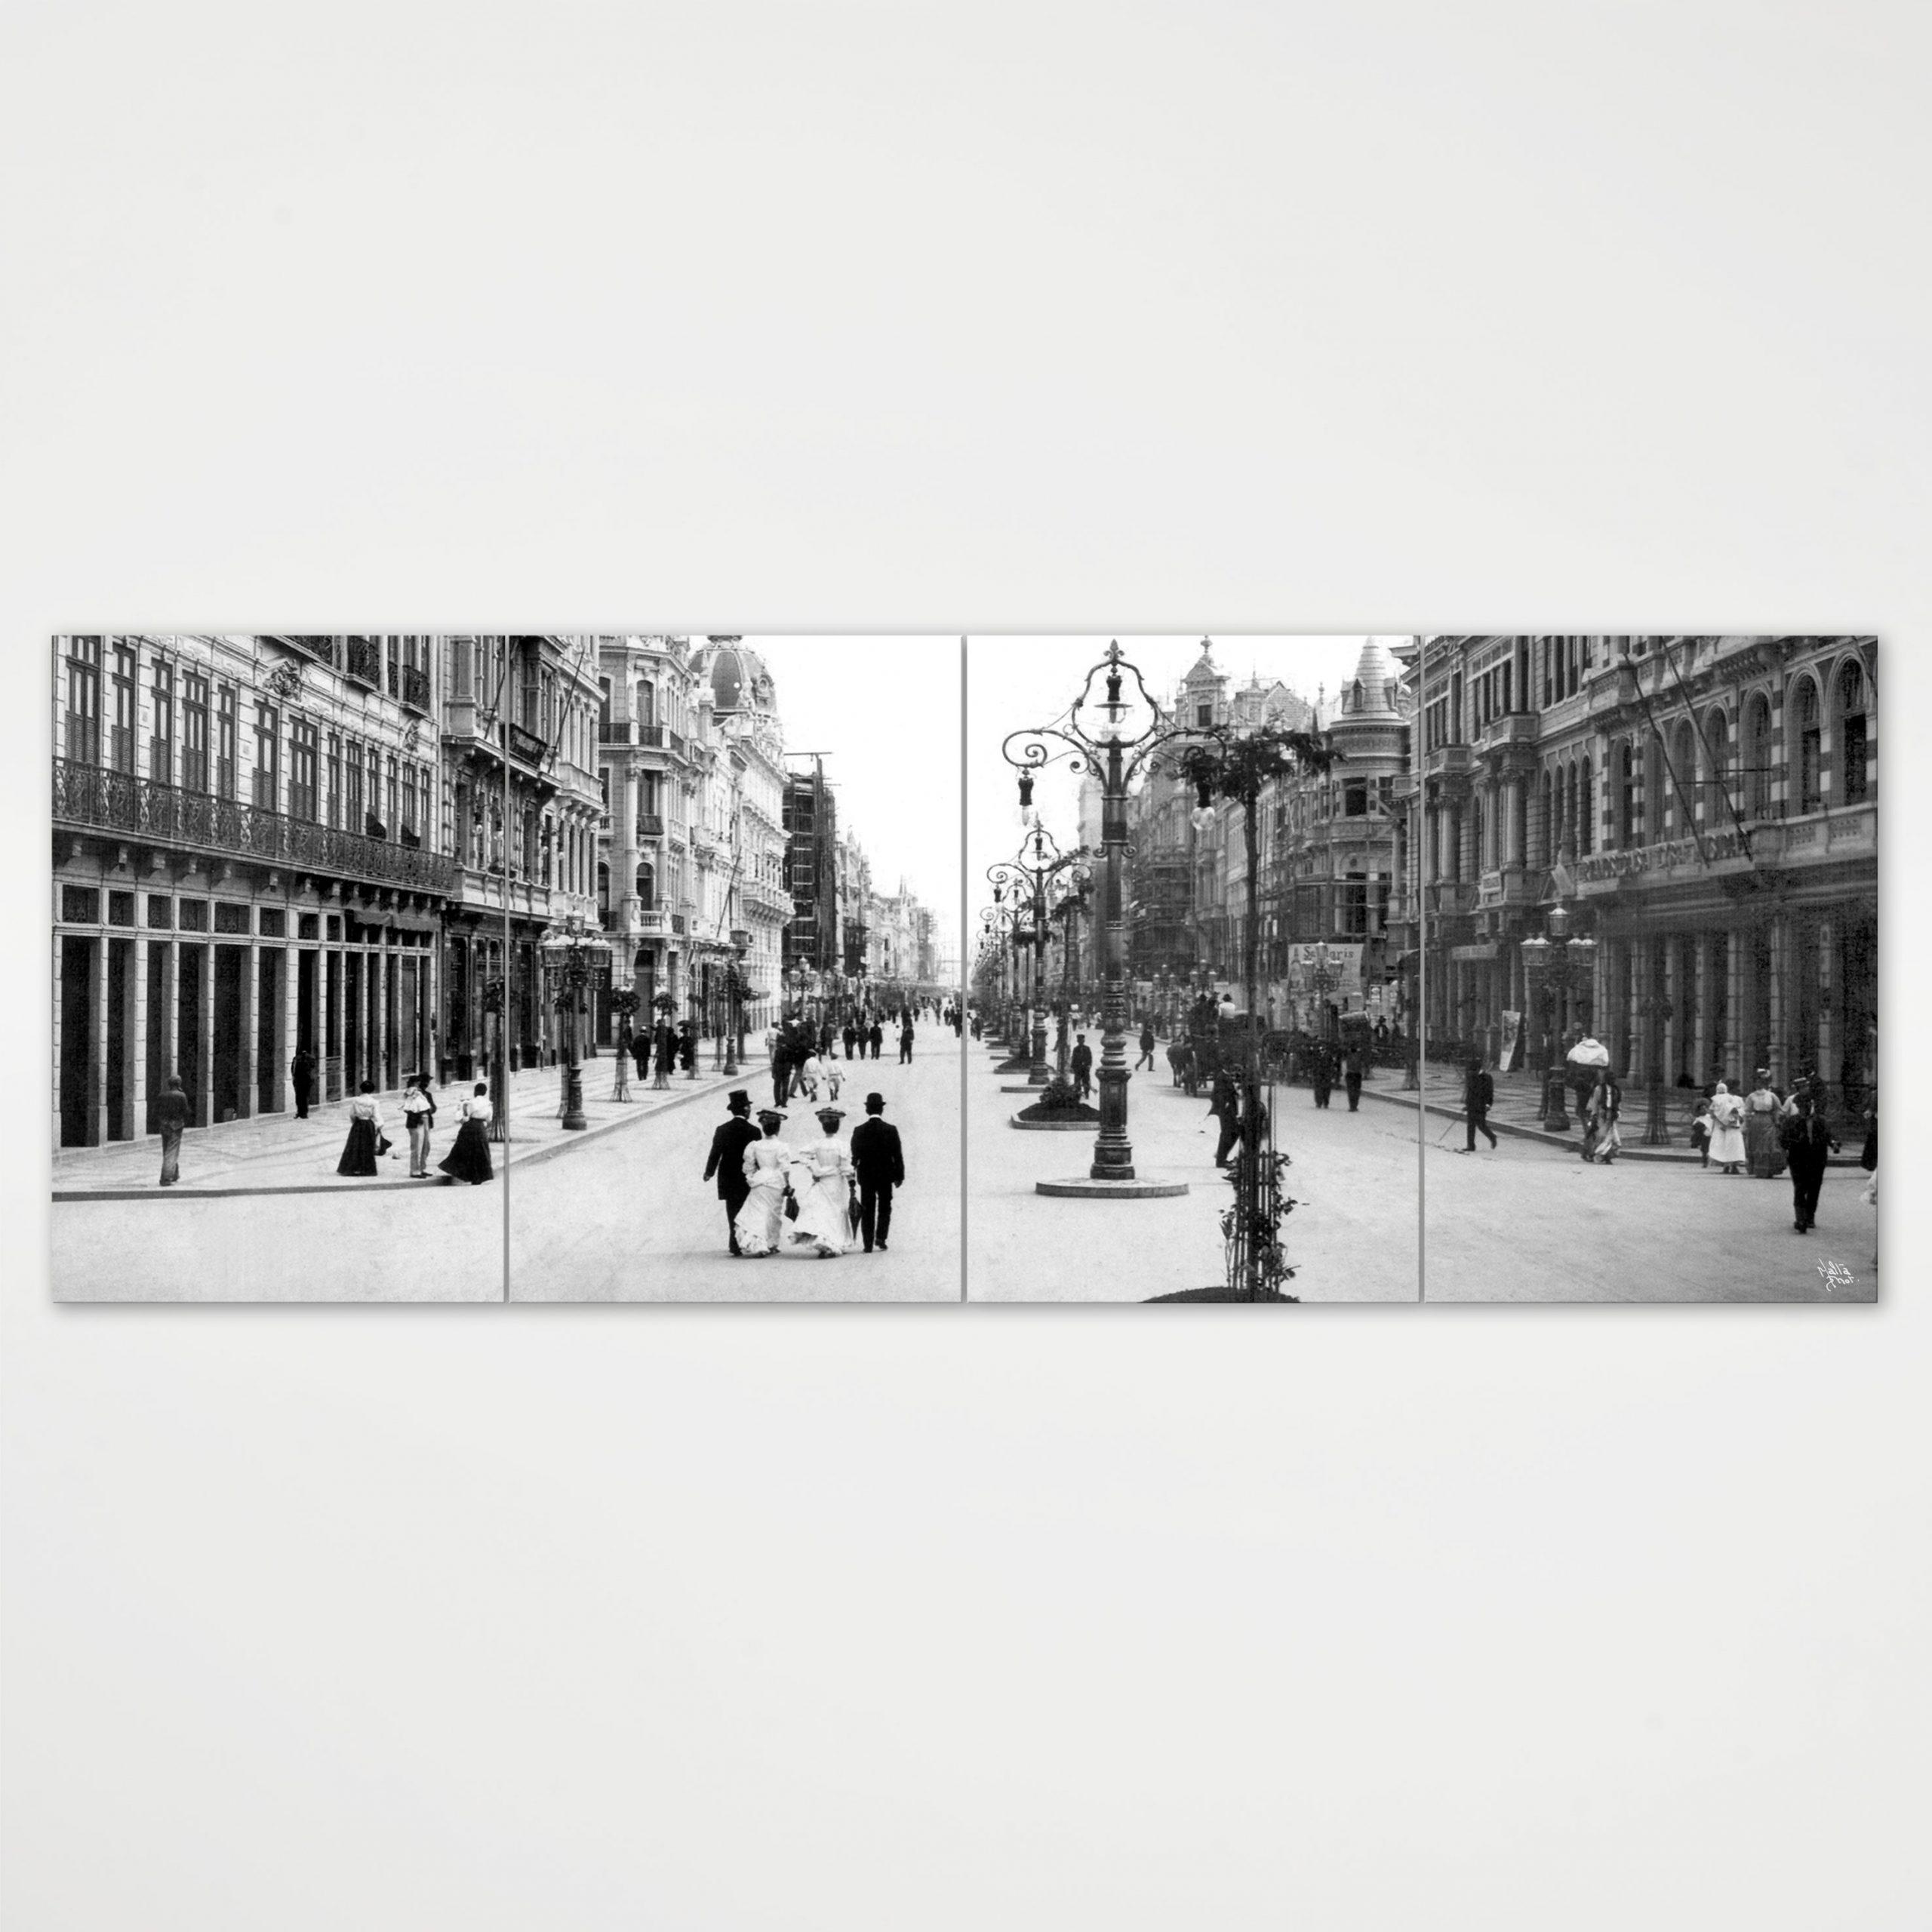 Painel Modular - Avenida Central - Ano 1905